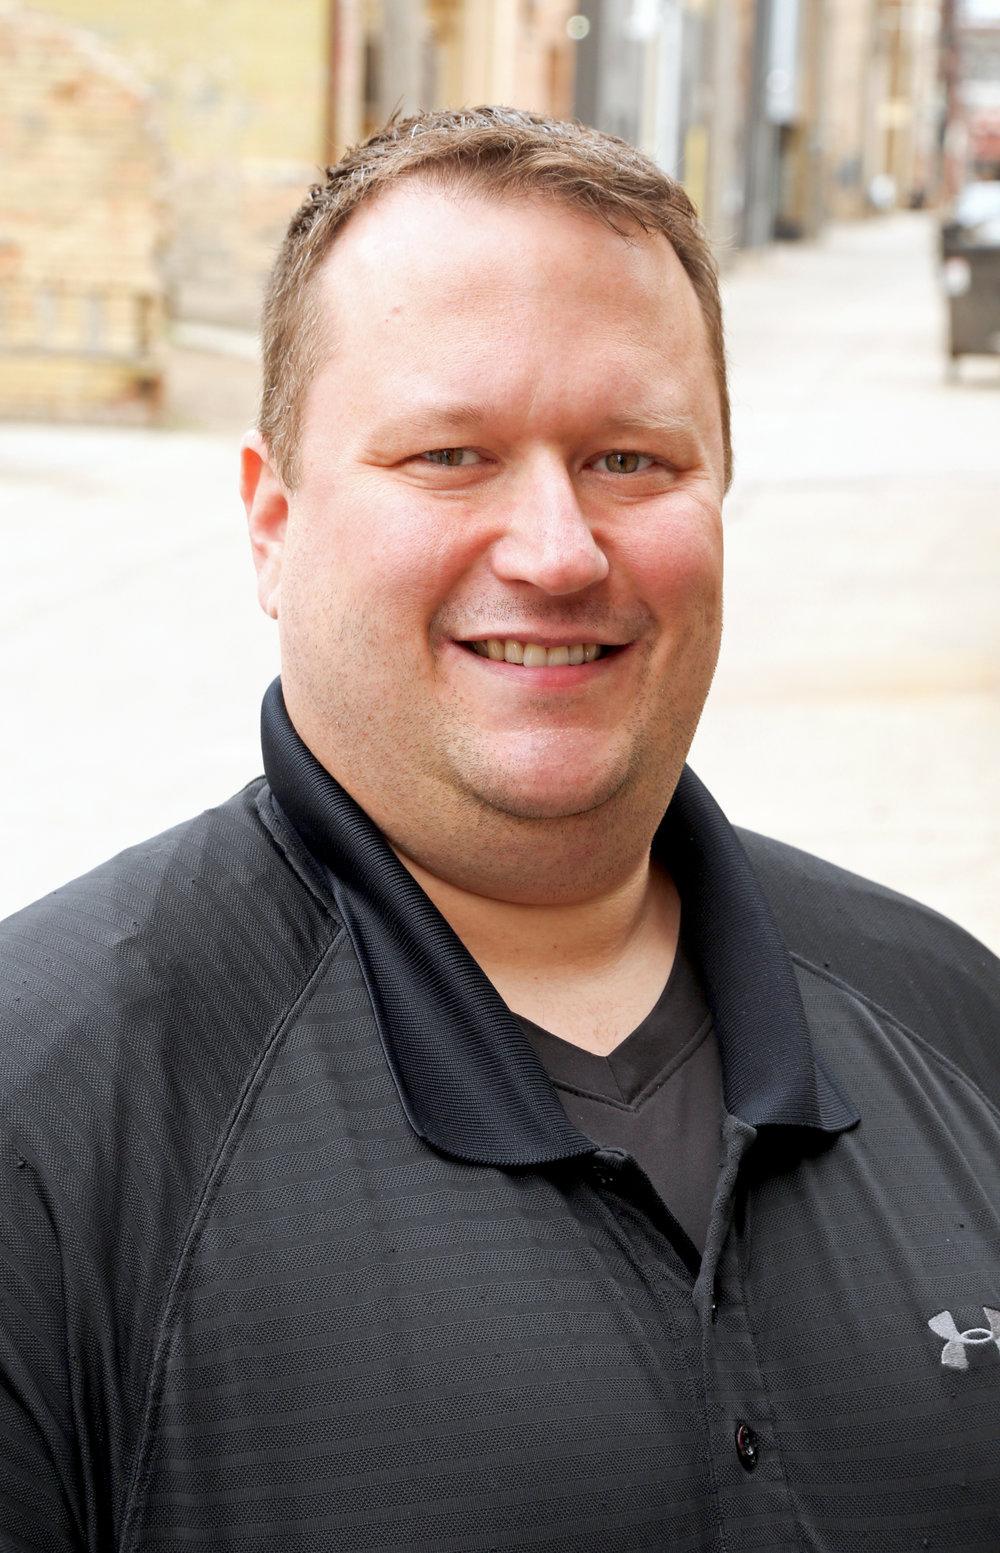 Brady Pederson - Regional ManagerFargo BranchCell: (701)793-1576brady.pederson@imaginehomelending.comNMLS#1630639/43561